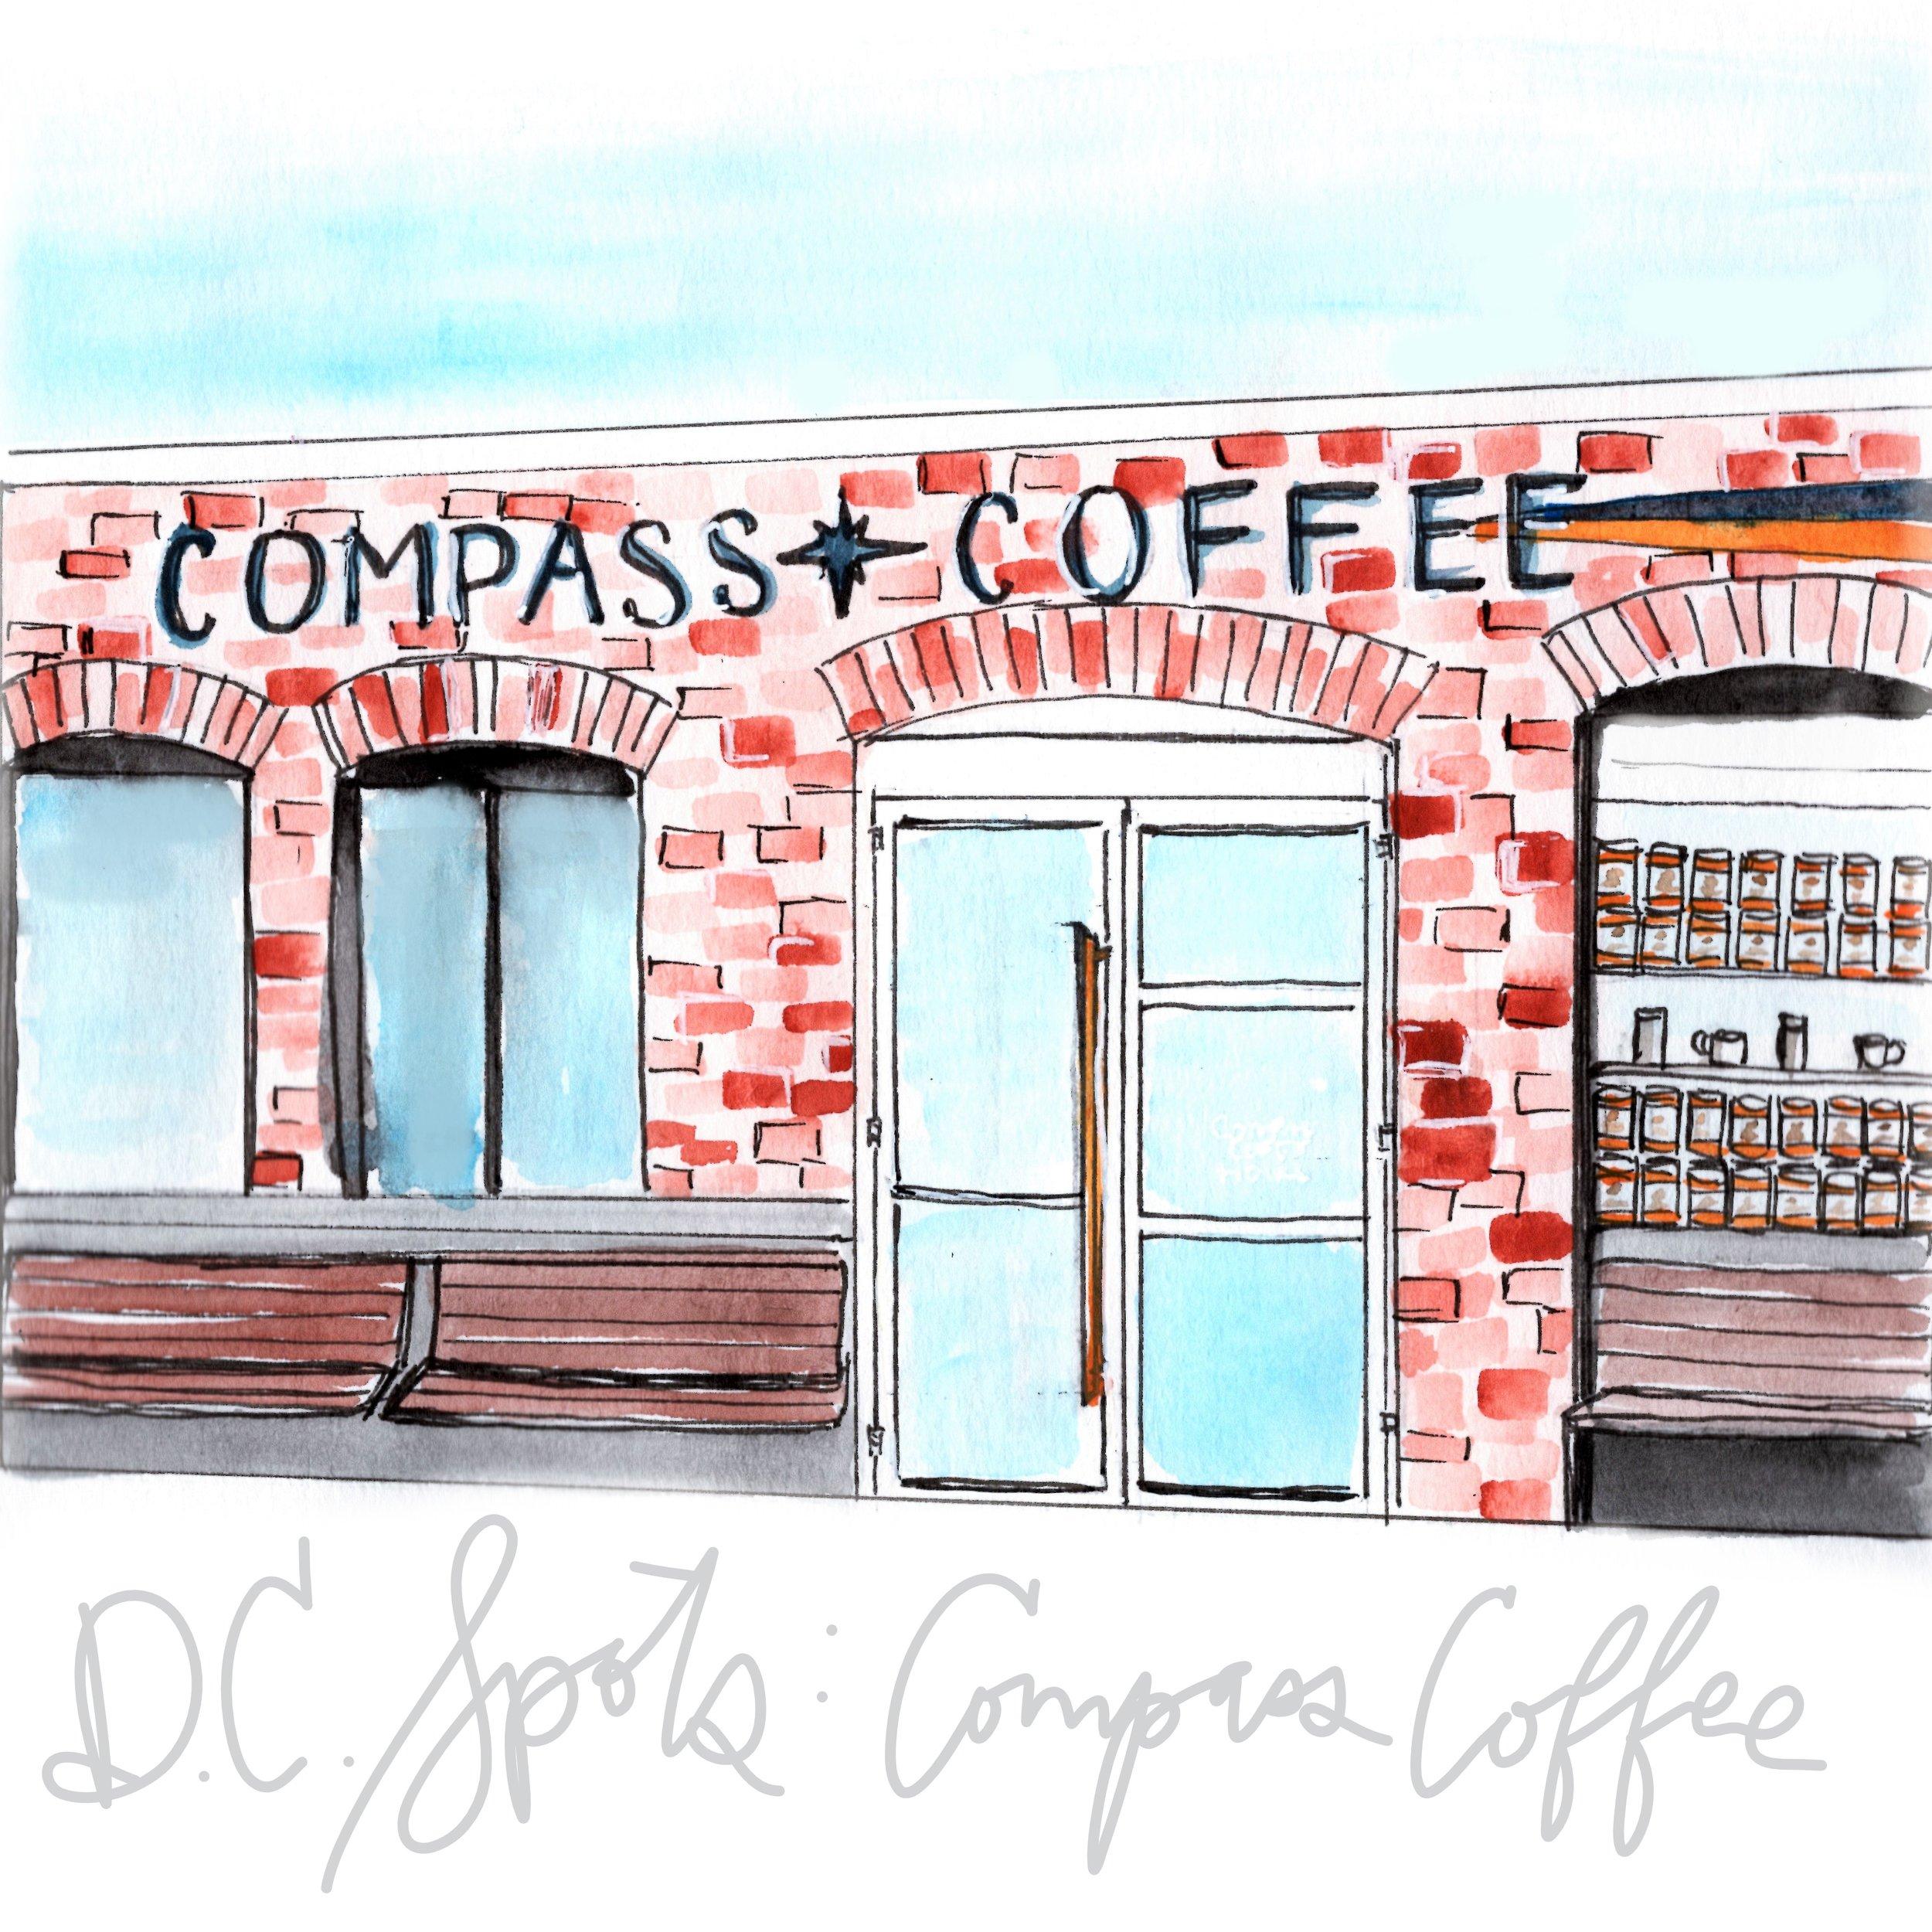 Desert 2 District Design II Compass Coffee - 7th Street